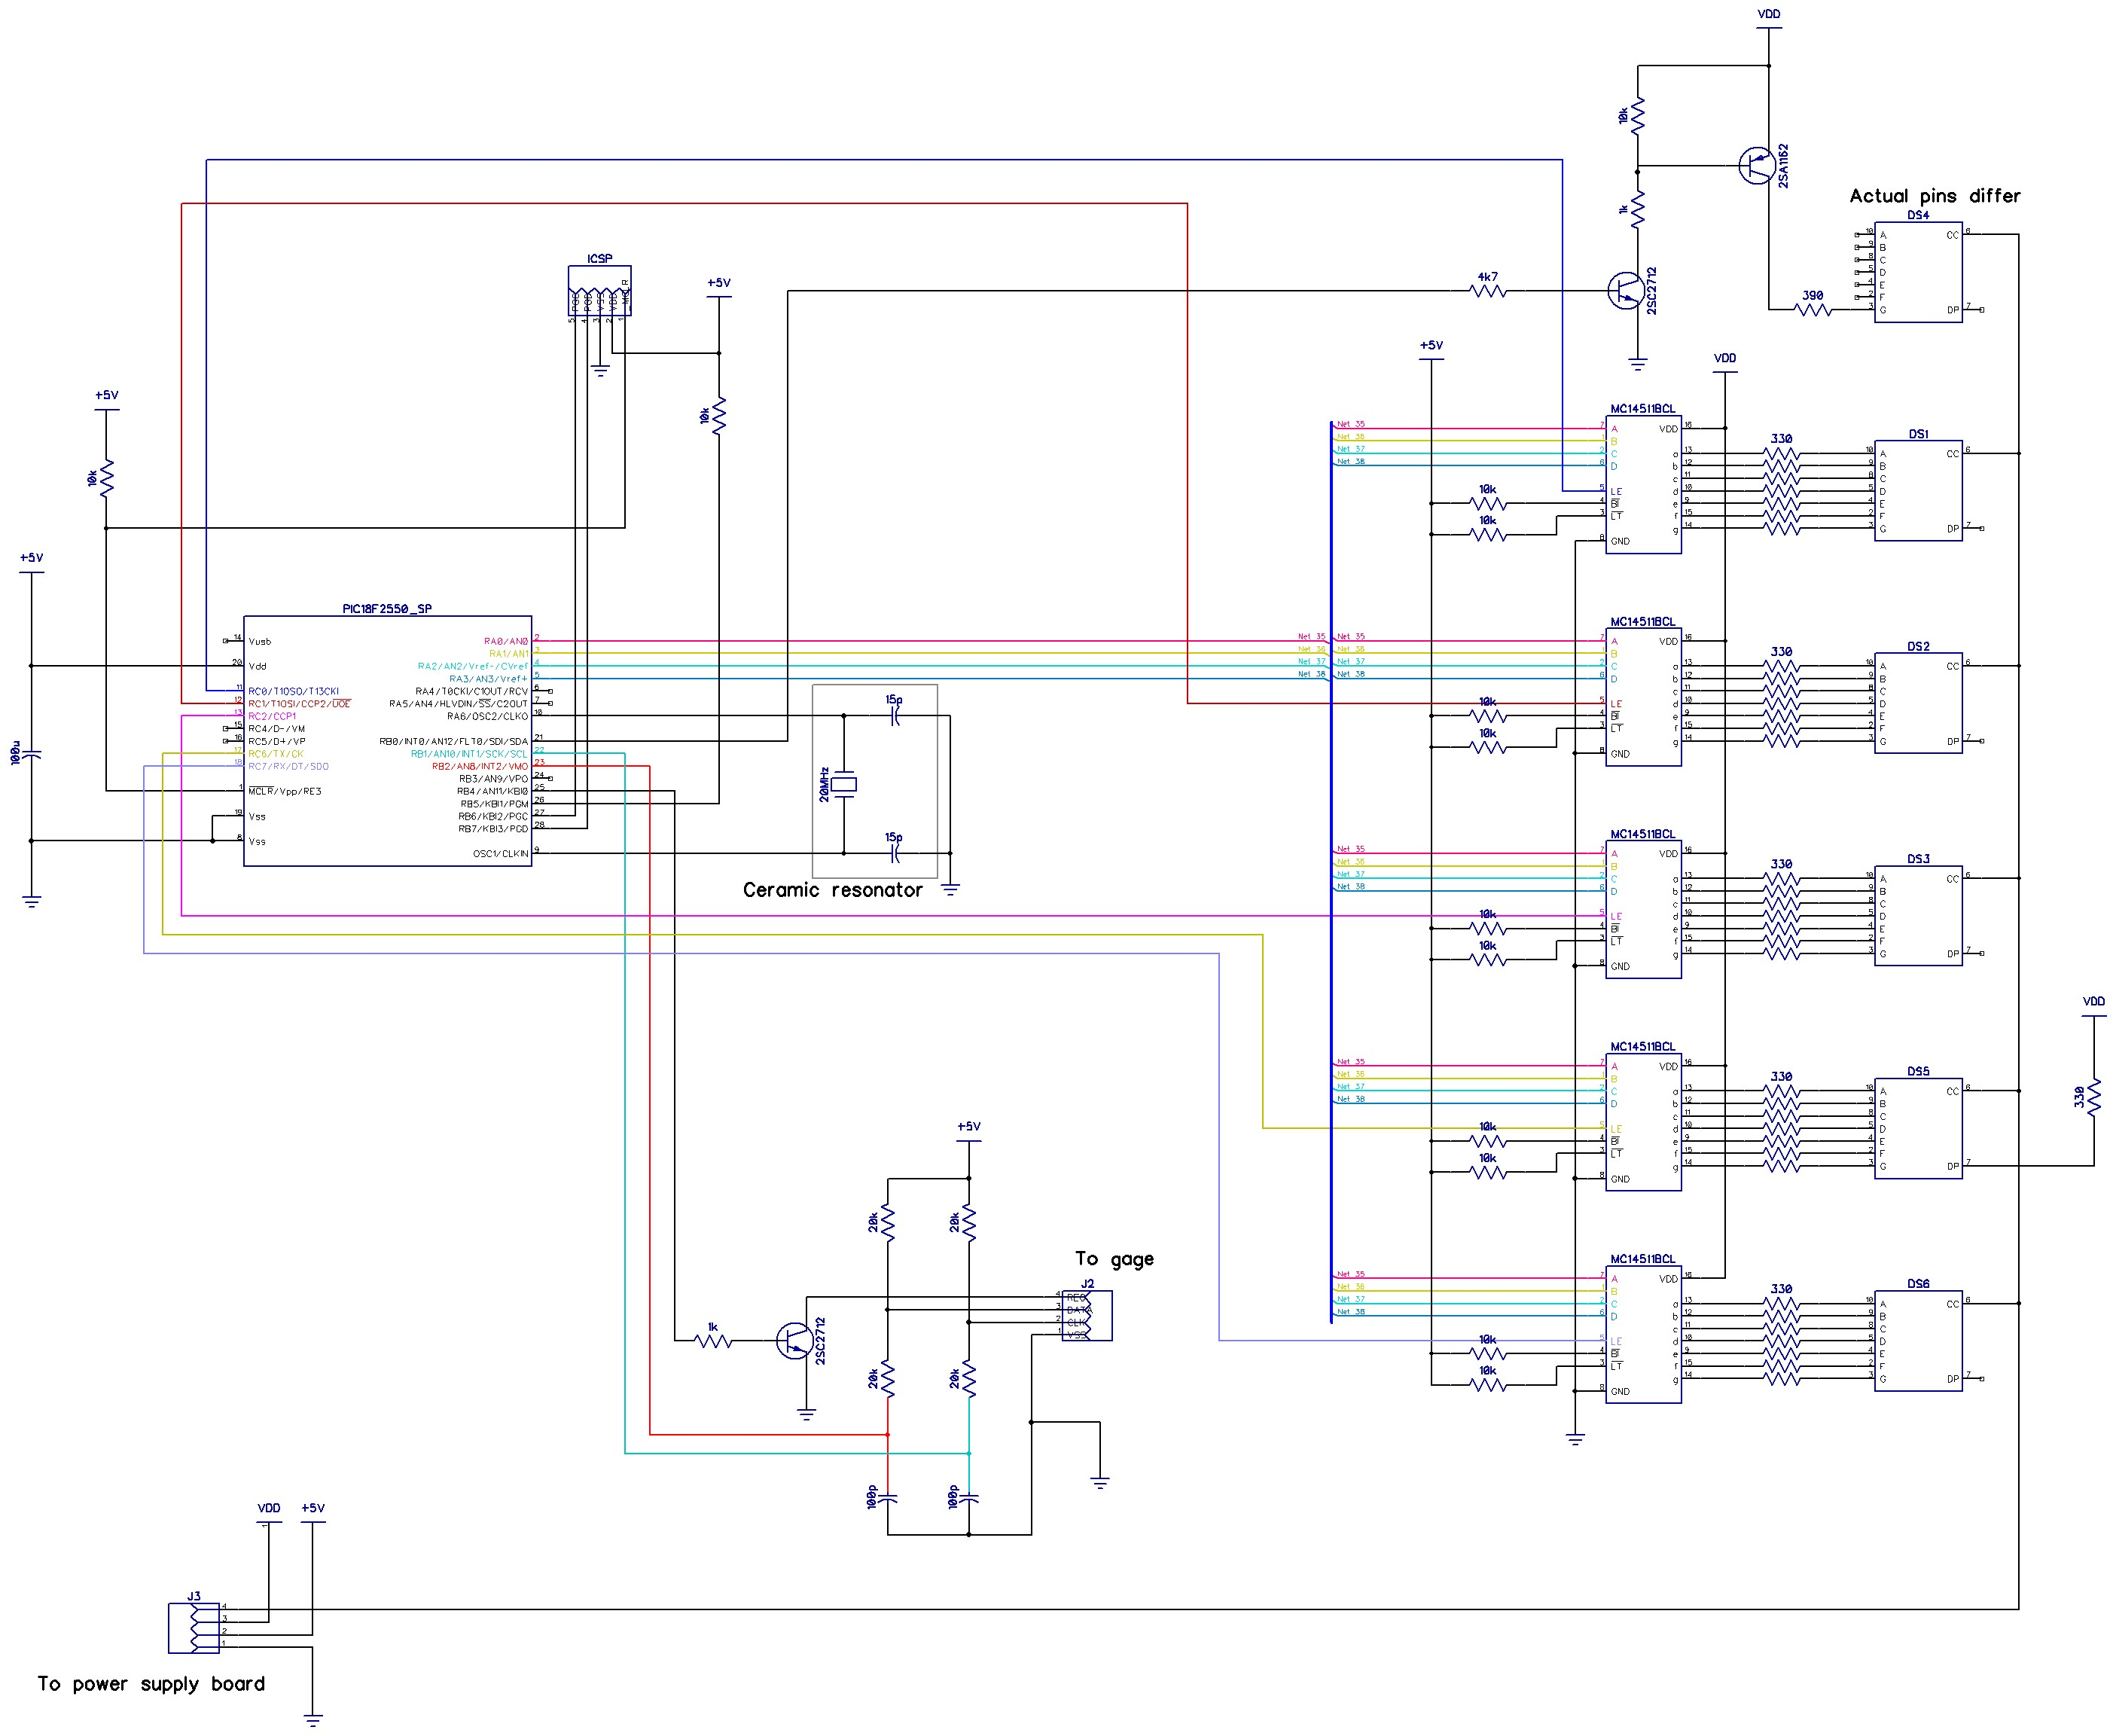 Readout board circuit diagram